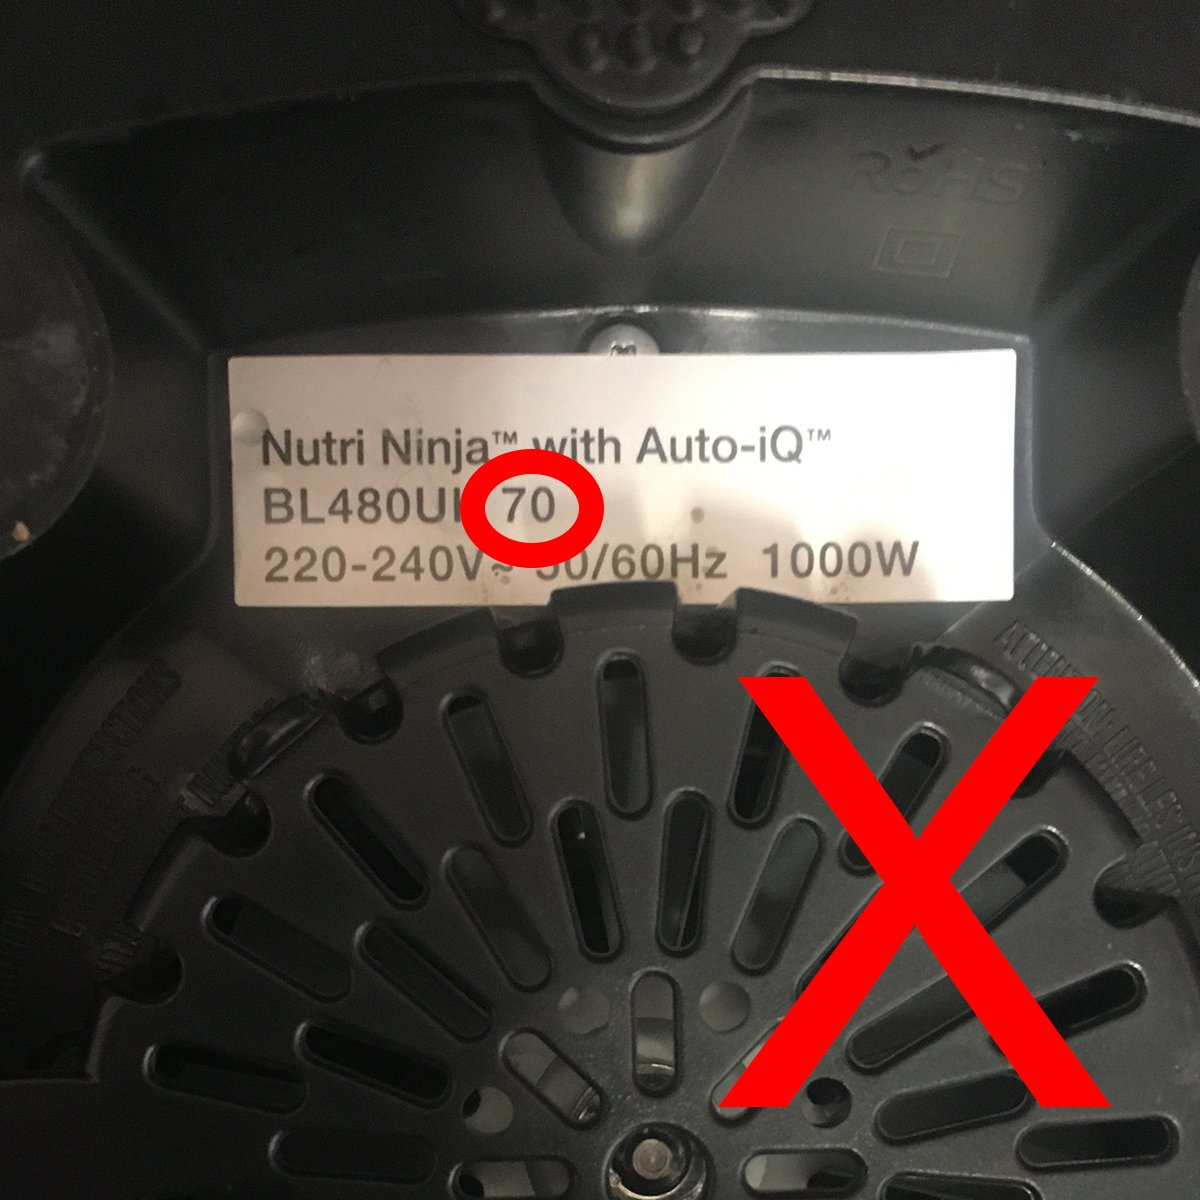 Nutri Ninja Pro Cuchillas extraíbles Estándar: Amazon.es: Hogar